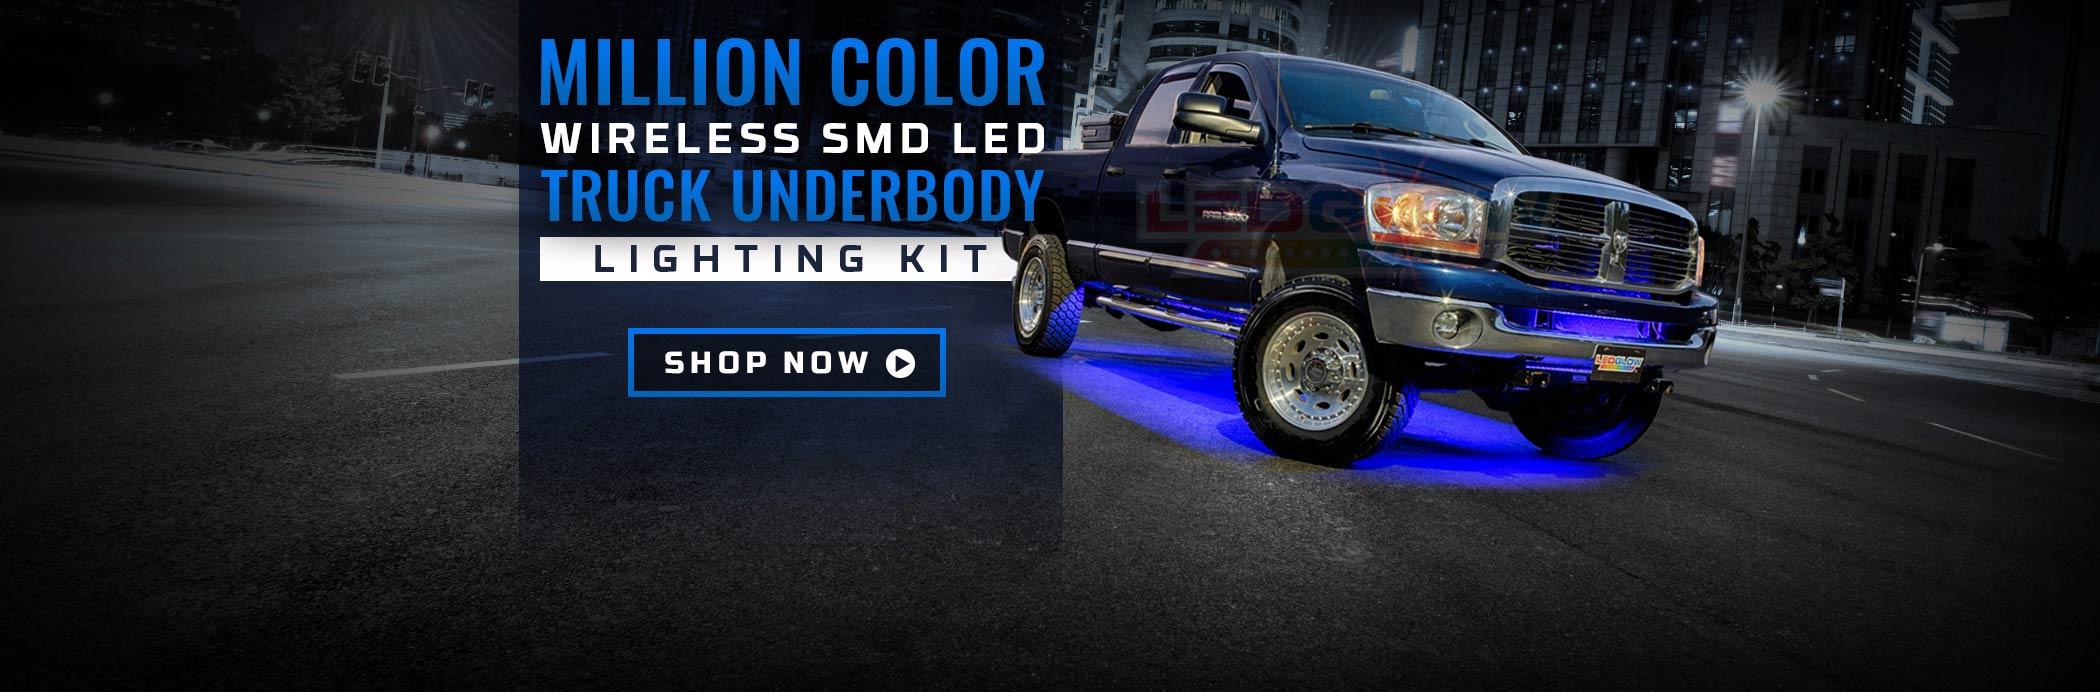 Million Color Wireless SMD Truck Underbody Lighting Kit